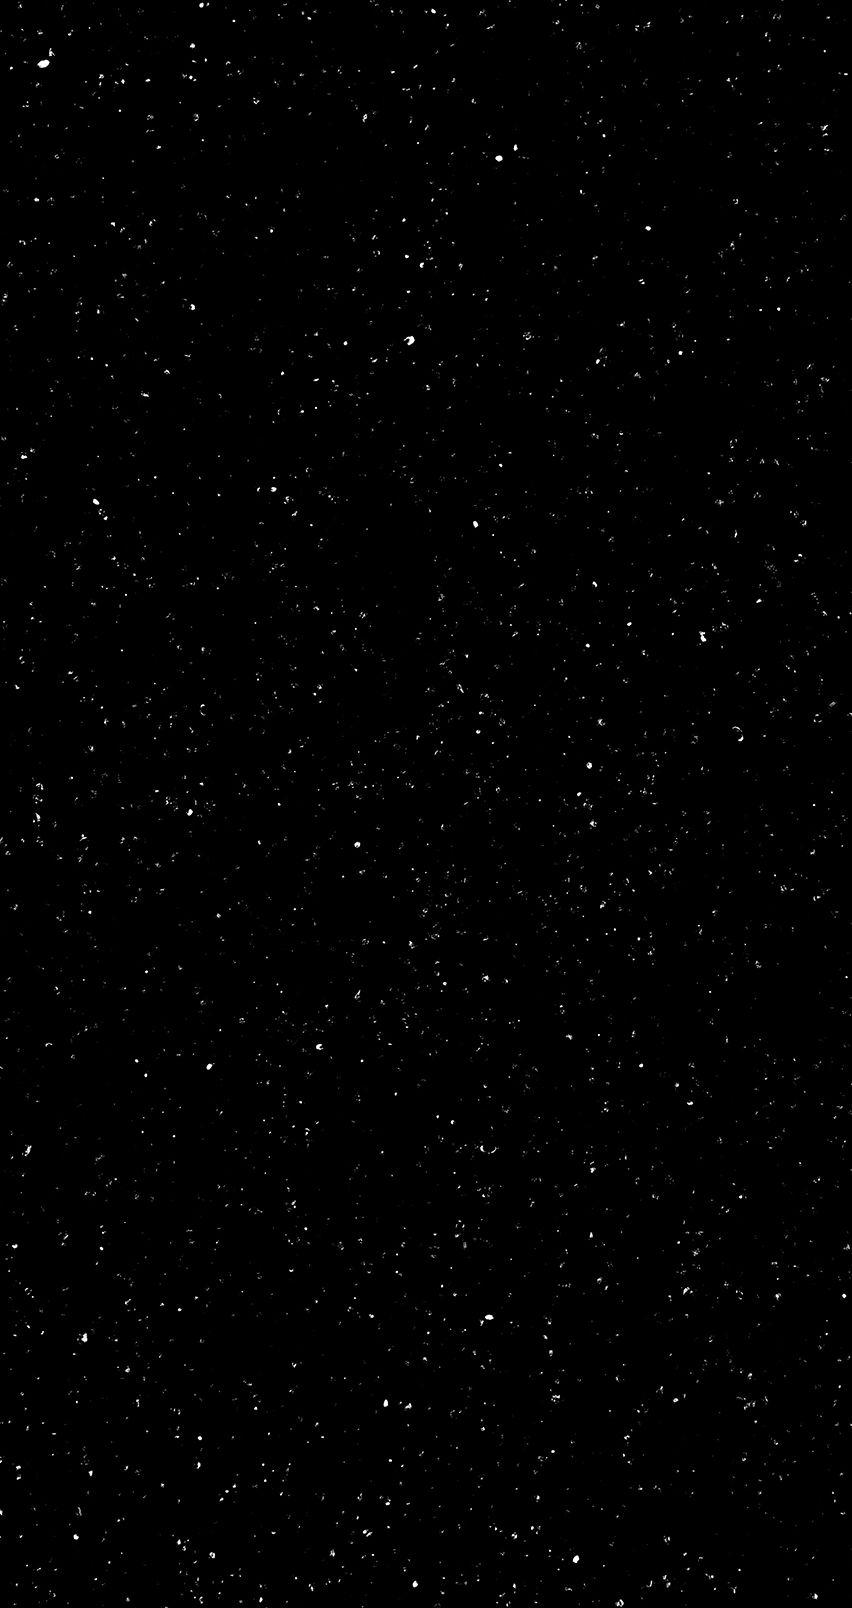 Night Black With Stars Black Star Background Black Aesthetic Wallpaper Black Glitter Wallpapers